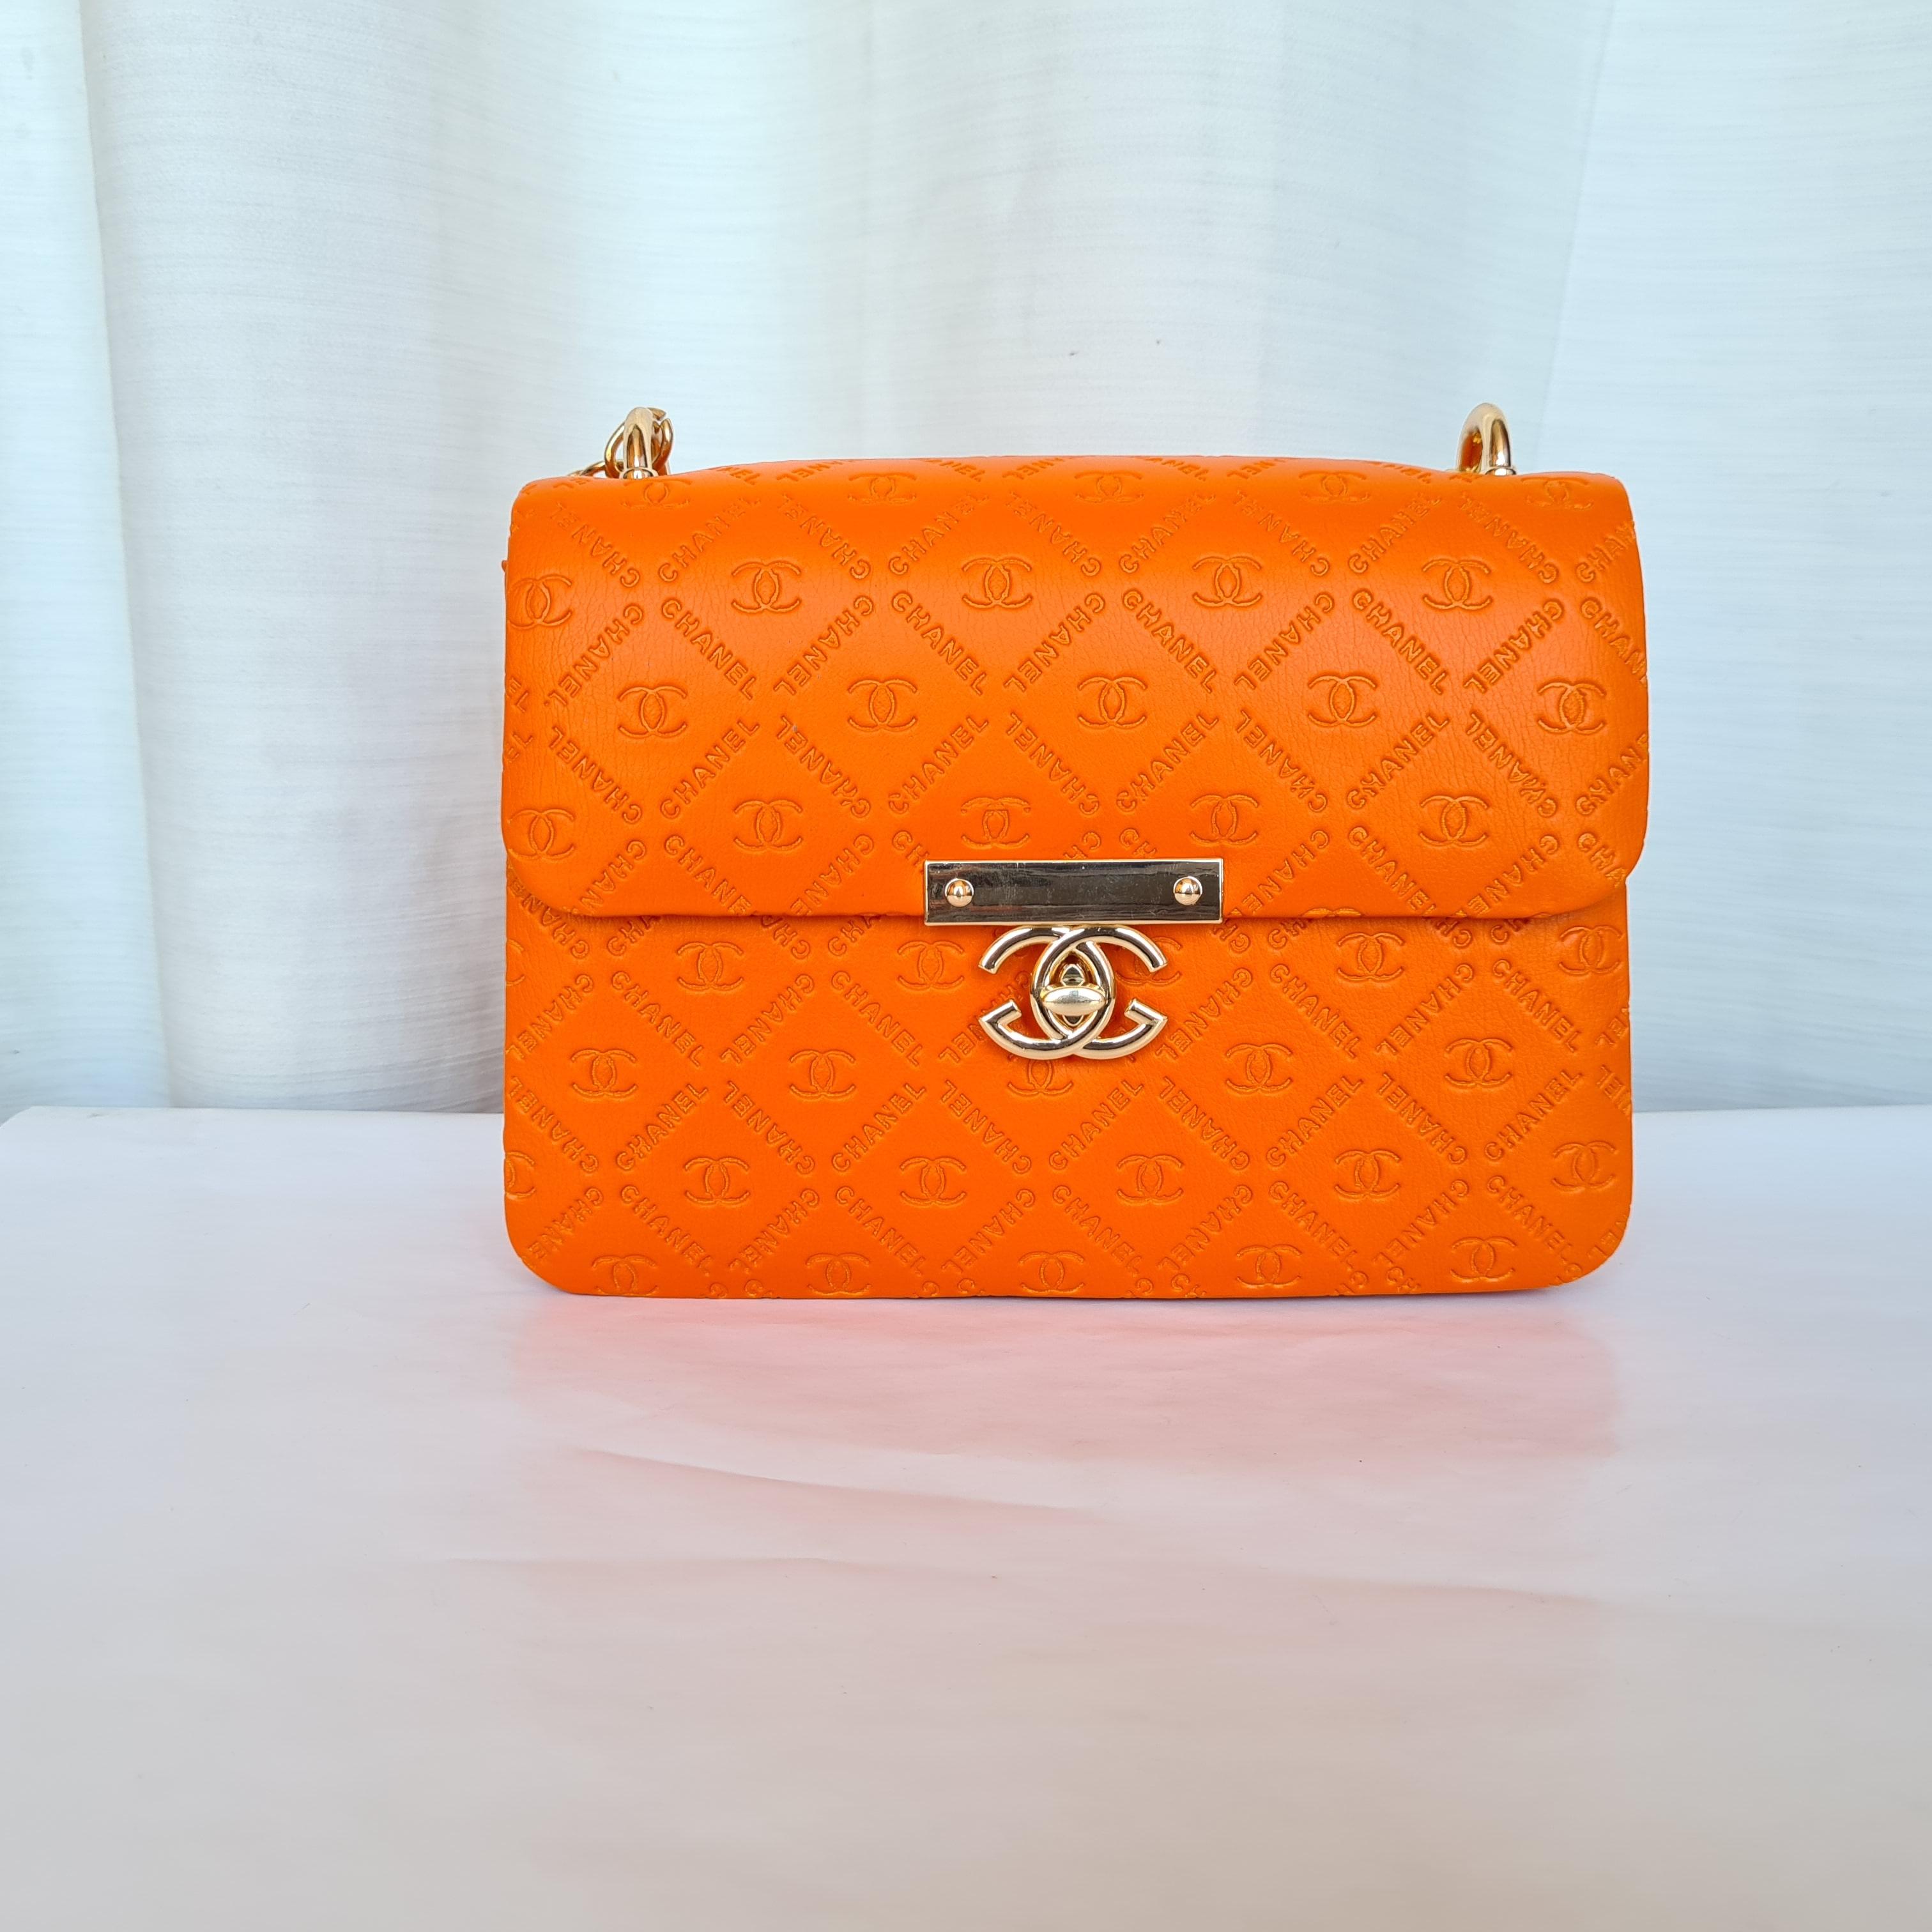 Chanel Ladies Stylish Small Hand Bags QB00179